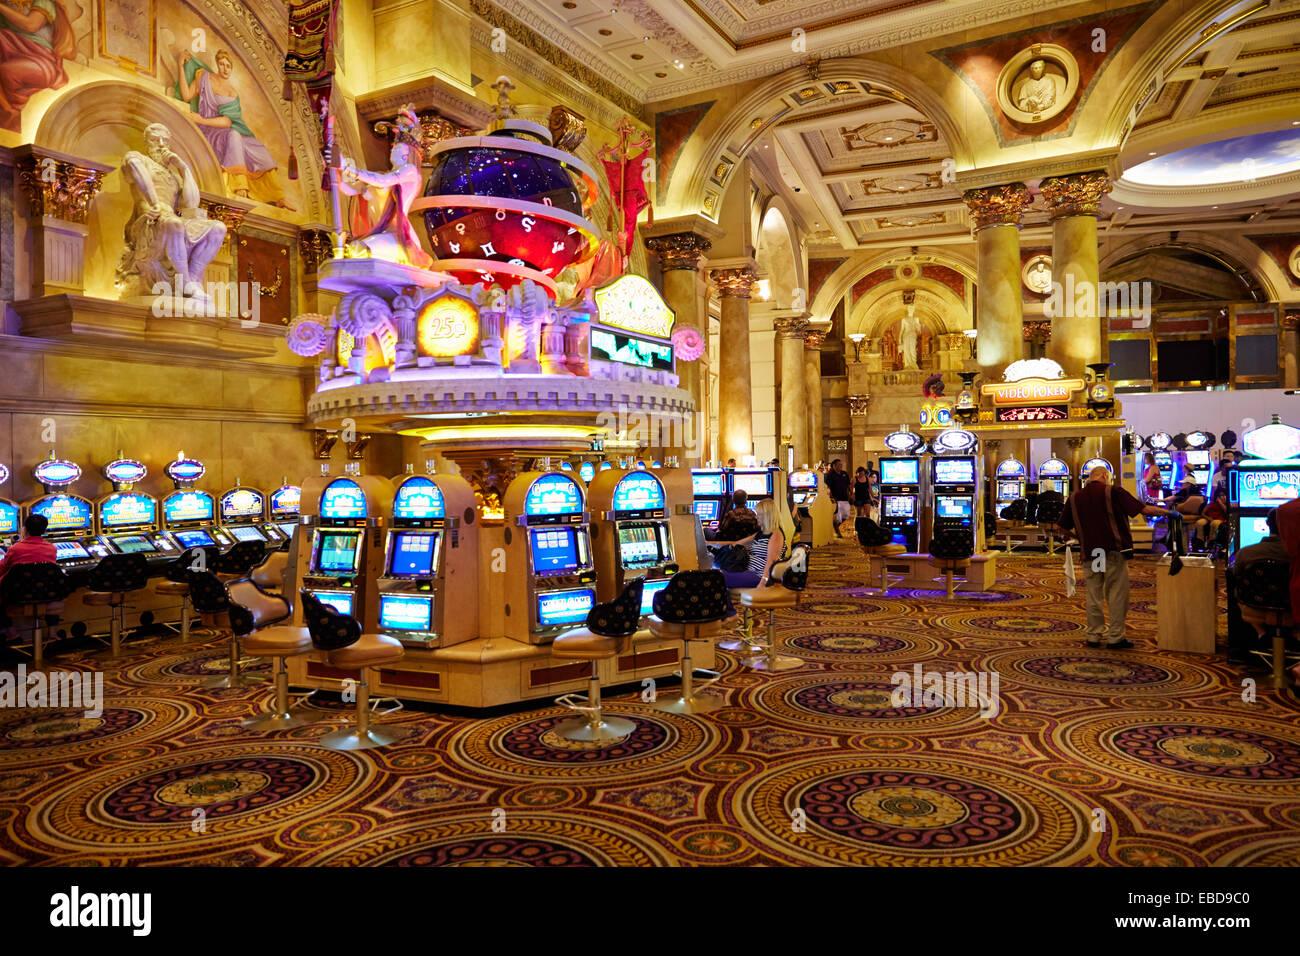 Slot v casino no deposit bonus